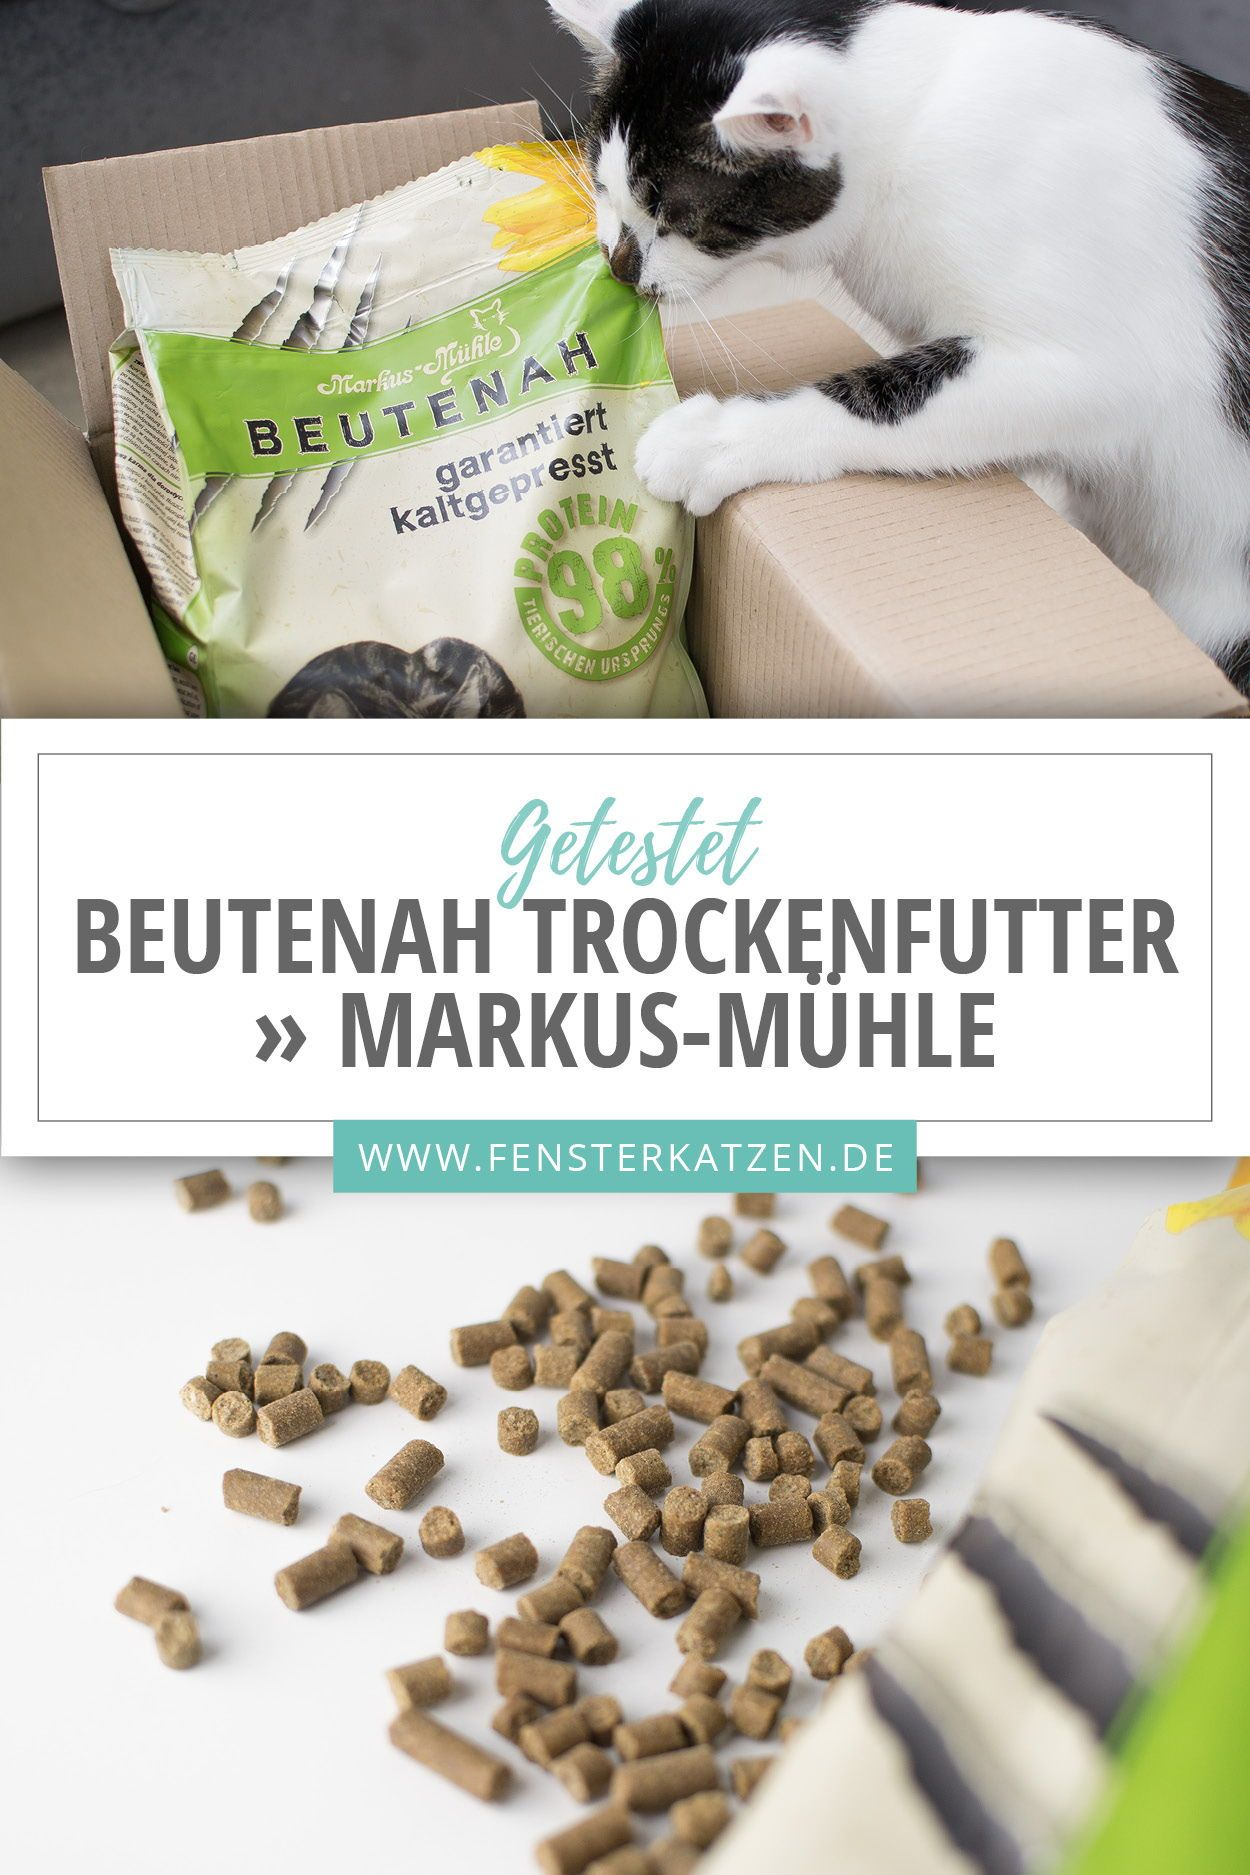 Beutenah Trockenfutter Markus Muhle Getestet In 2020 Katzennahrung Wenig Kohlenhydrate Katzen Futter